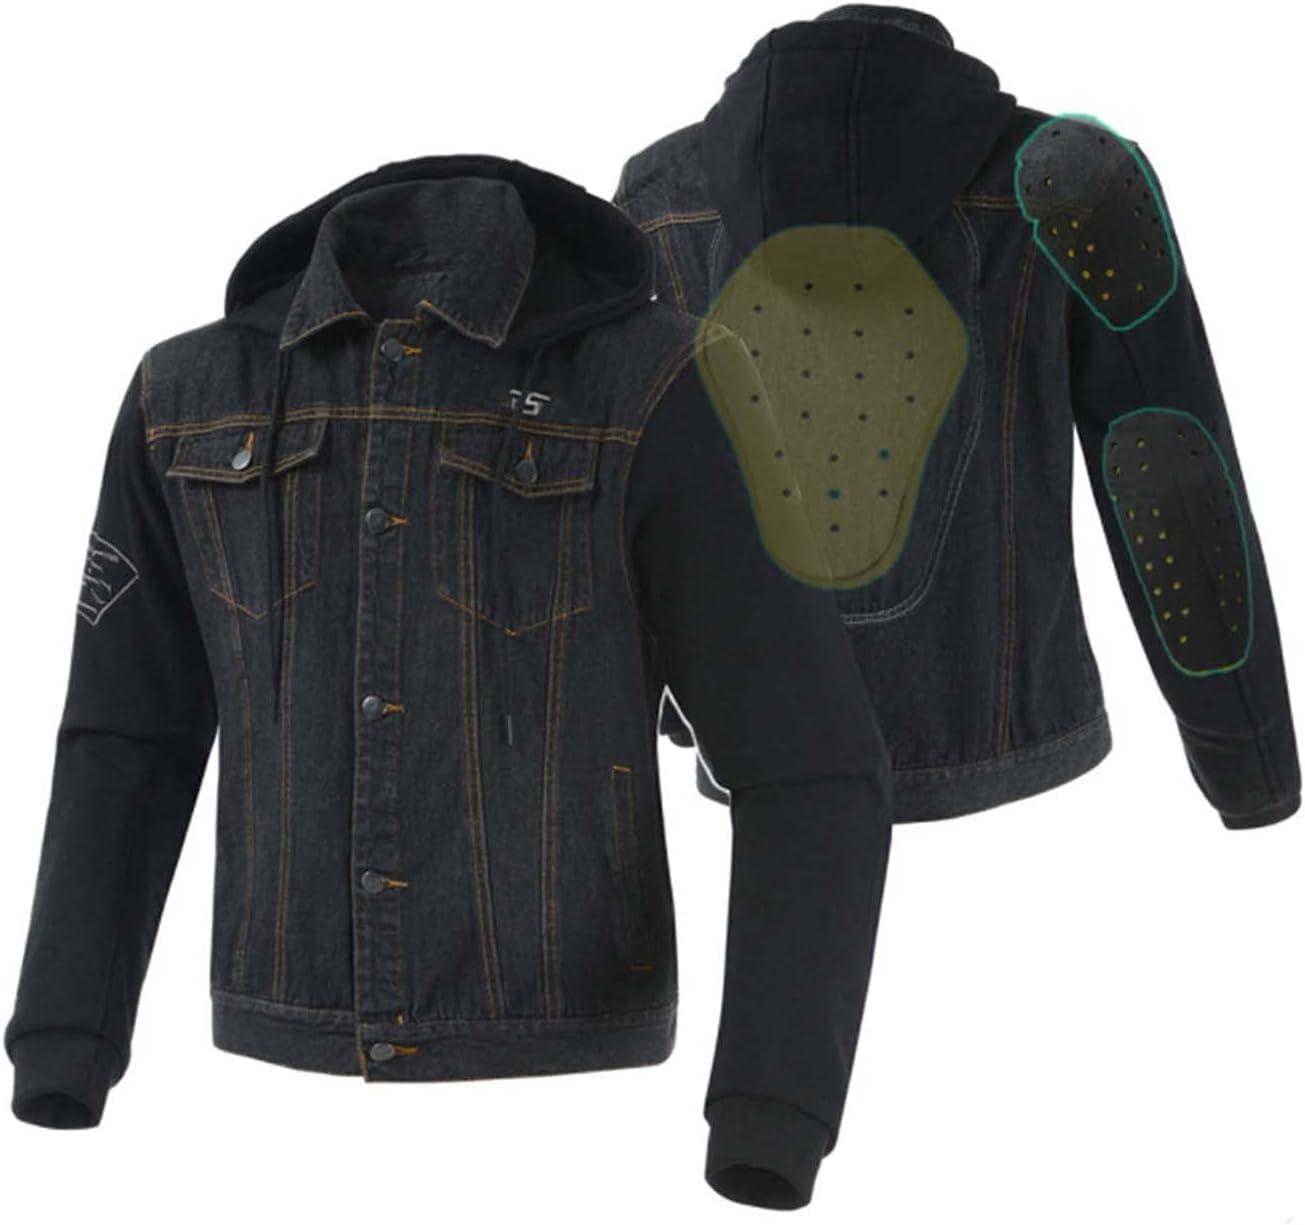 Weekly update CCCYT Motorcycle Motorbike latest Protective Mu Jacket Armoured Textile